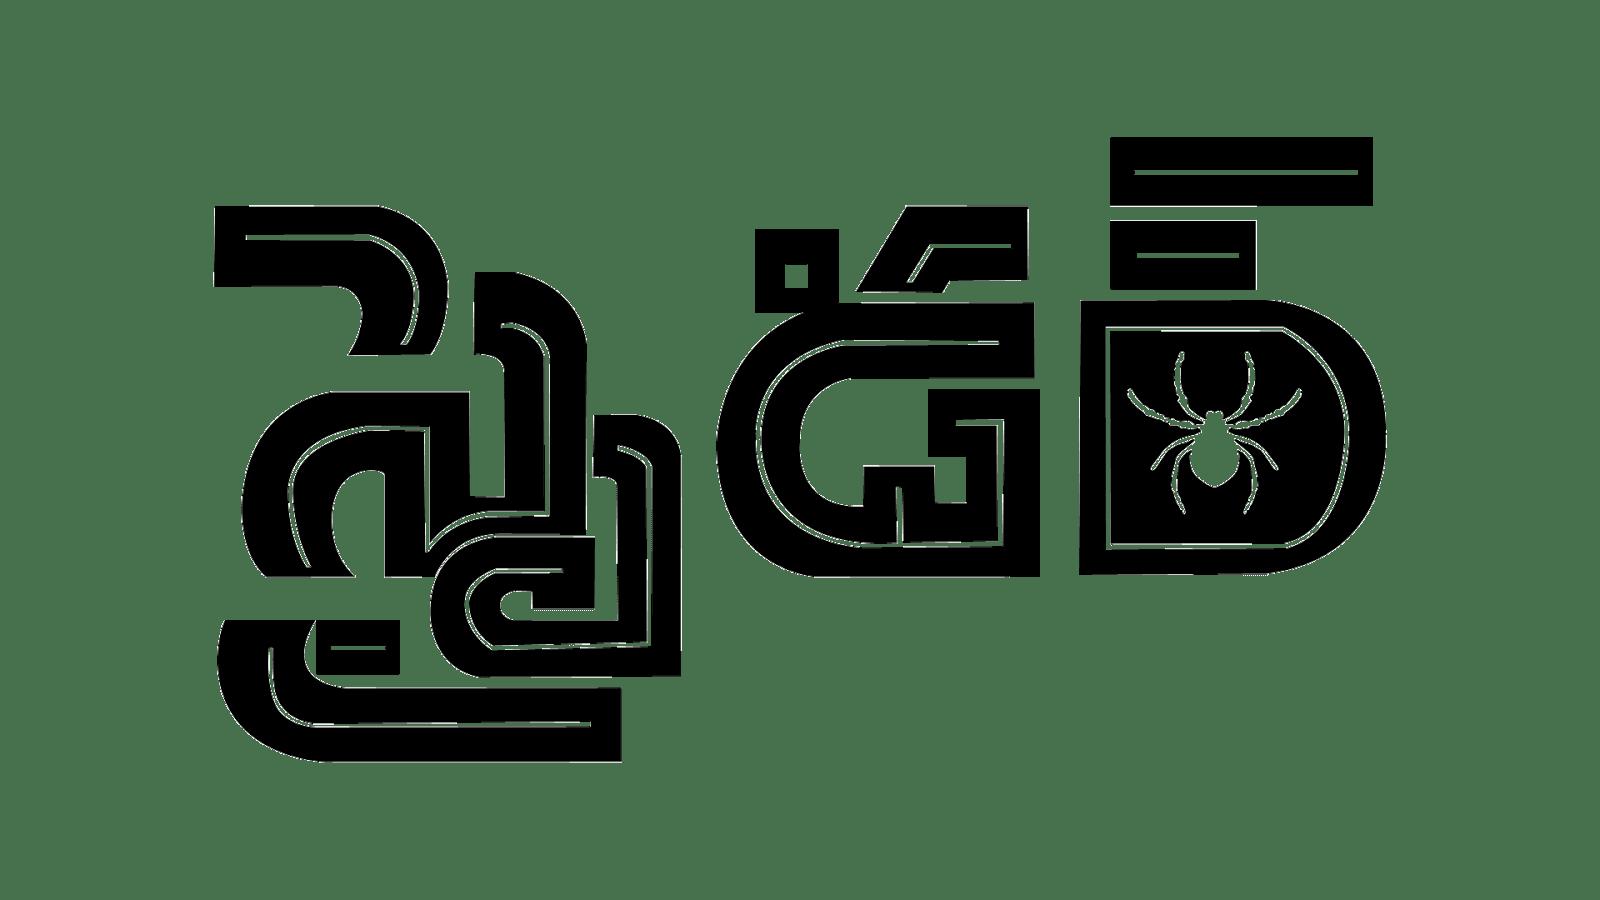 Spyder telugu movie title